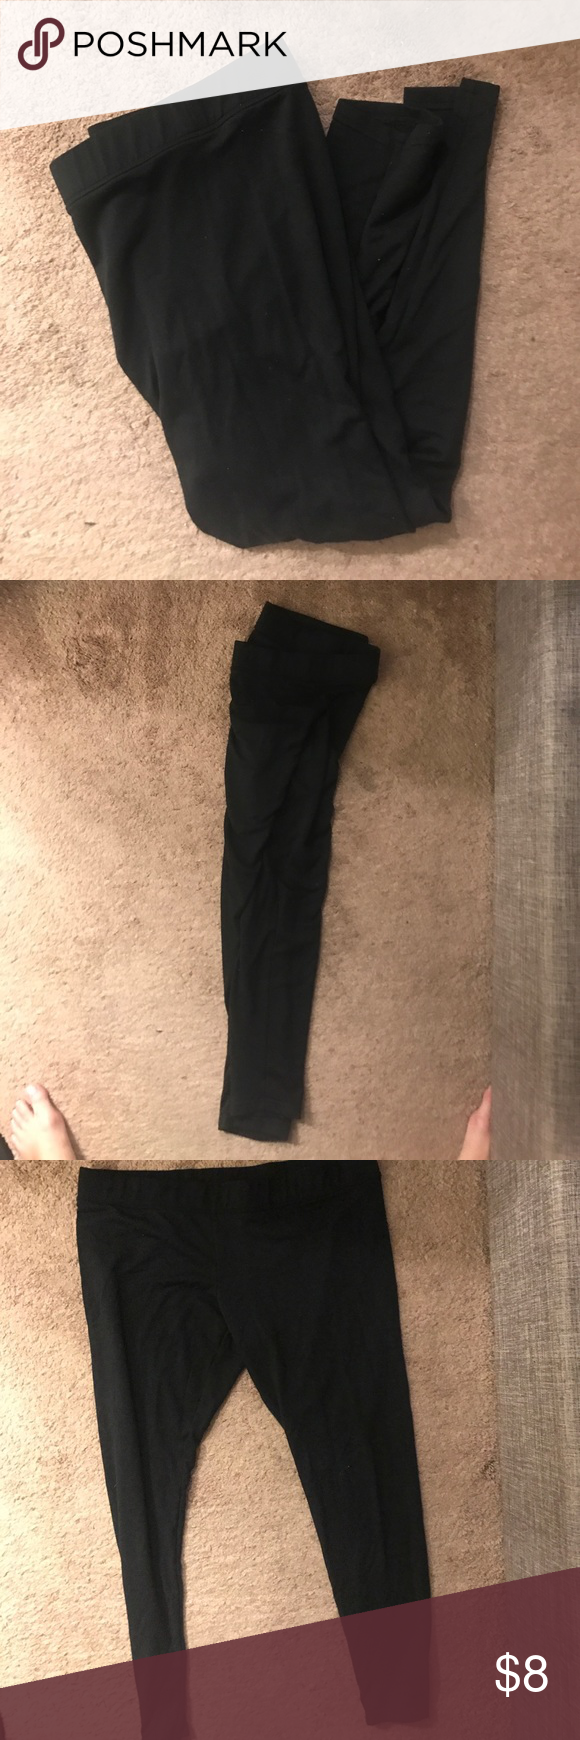 ba166e88258ed9 Merona leggings Merona leggings. Thicker then typical leggings. Worn once  from a smoke free home. See picture for material. Merona Pants Leggings